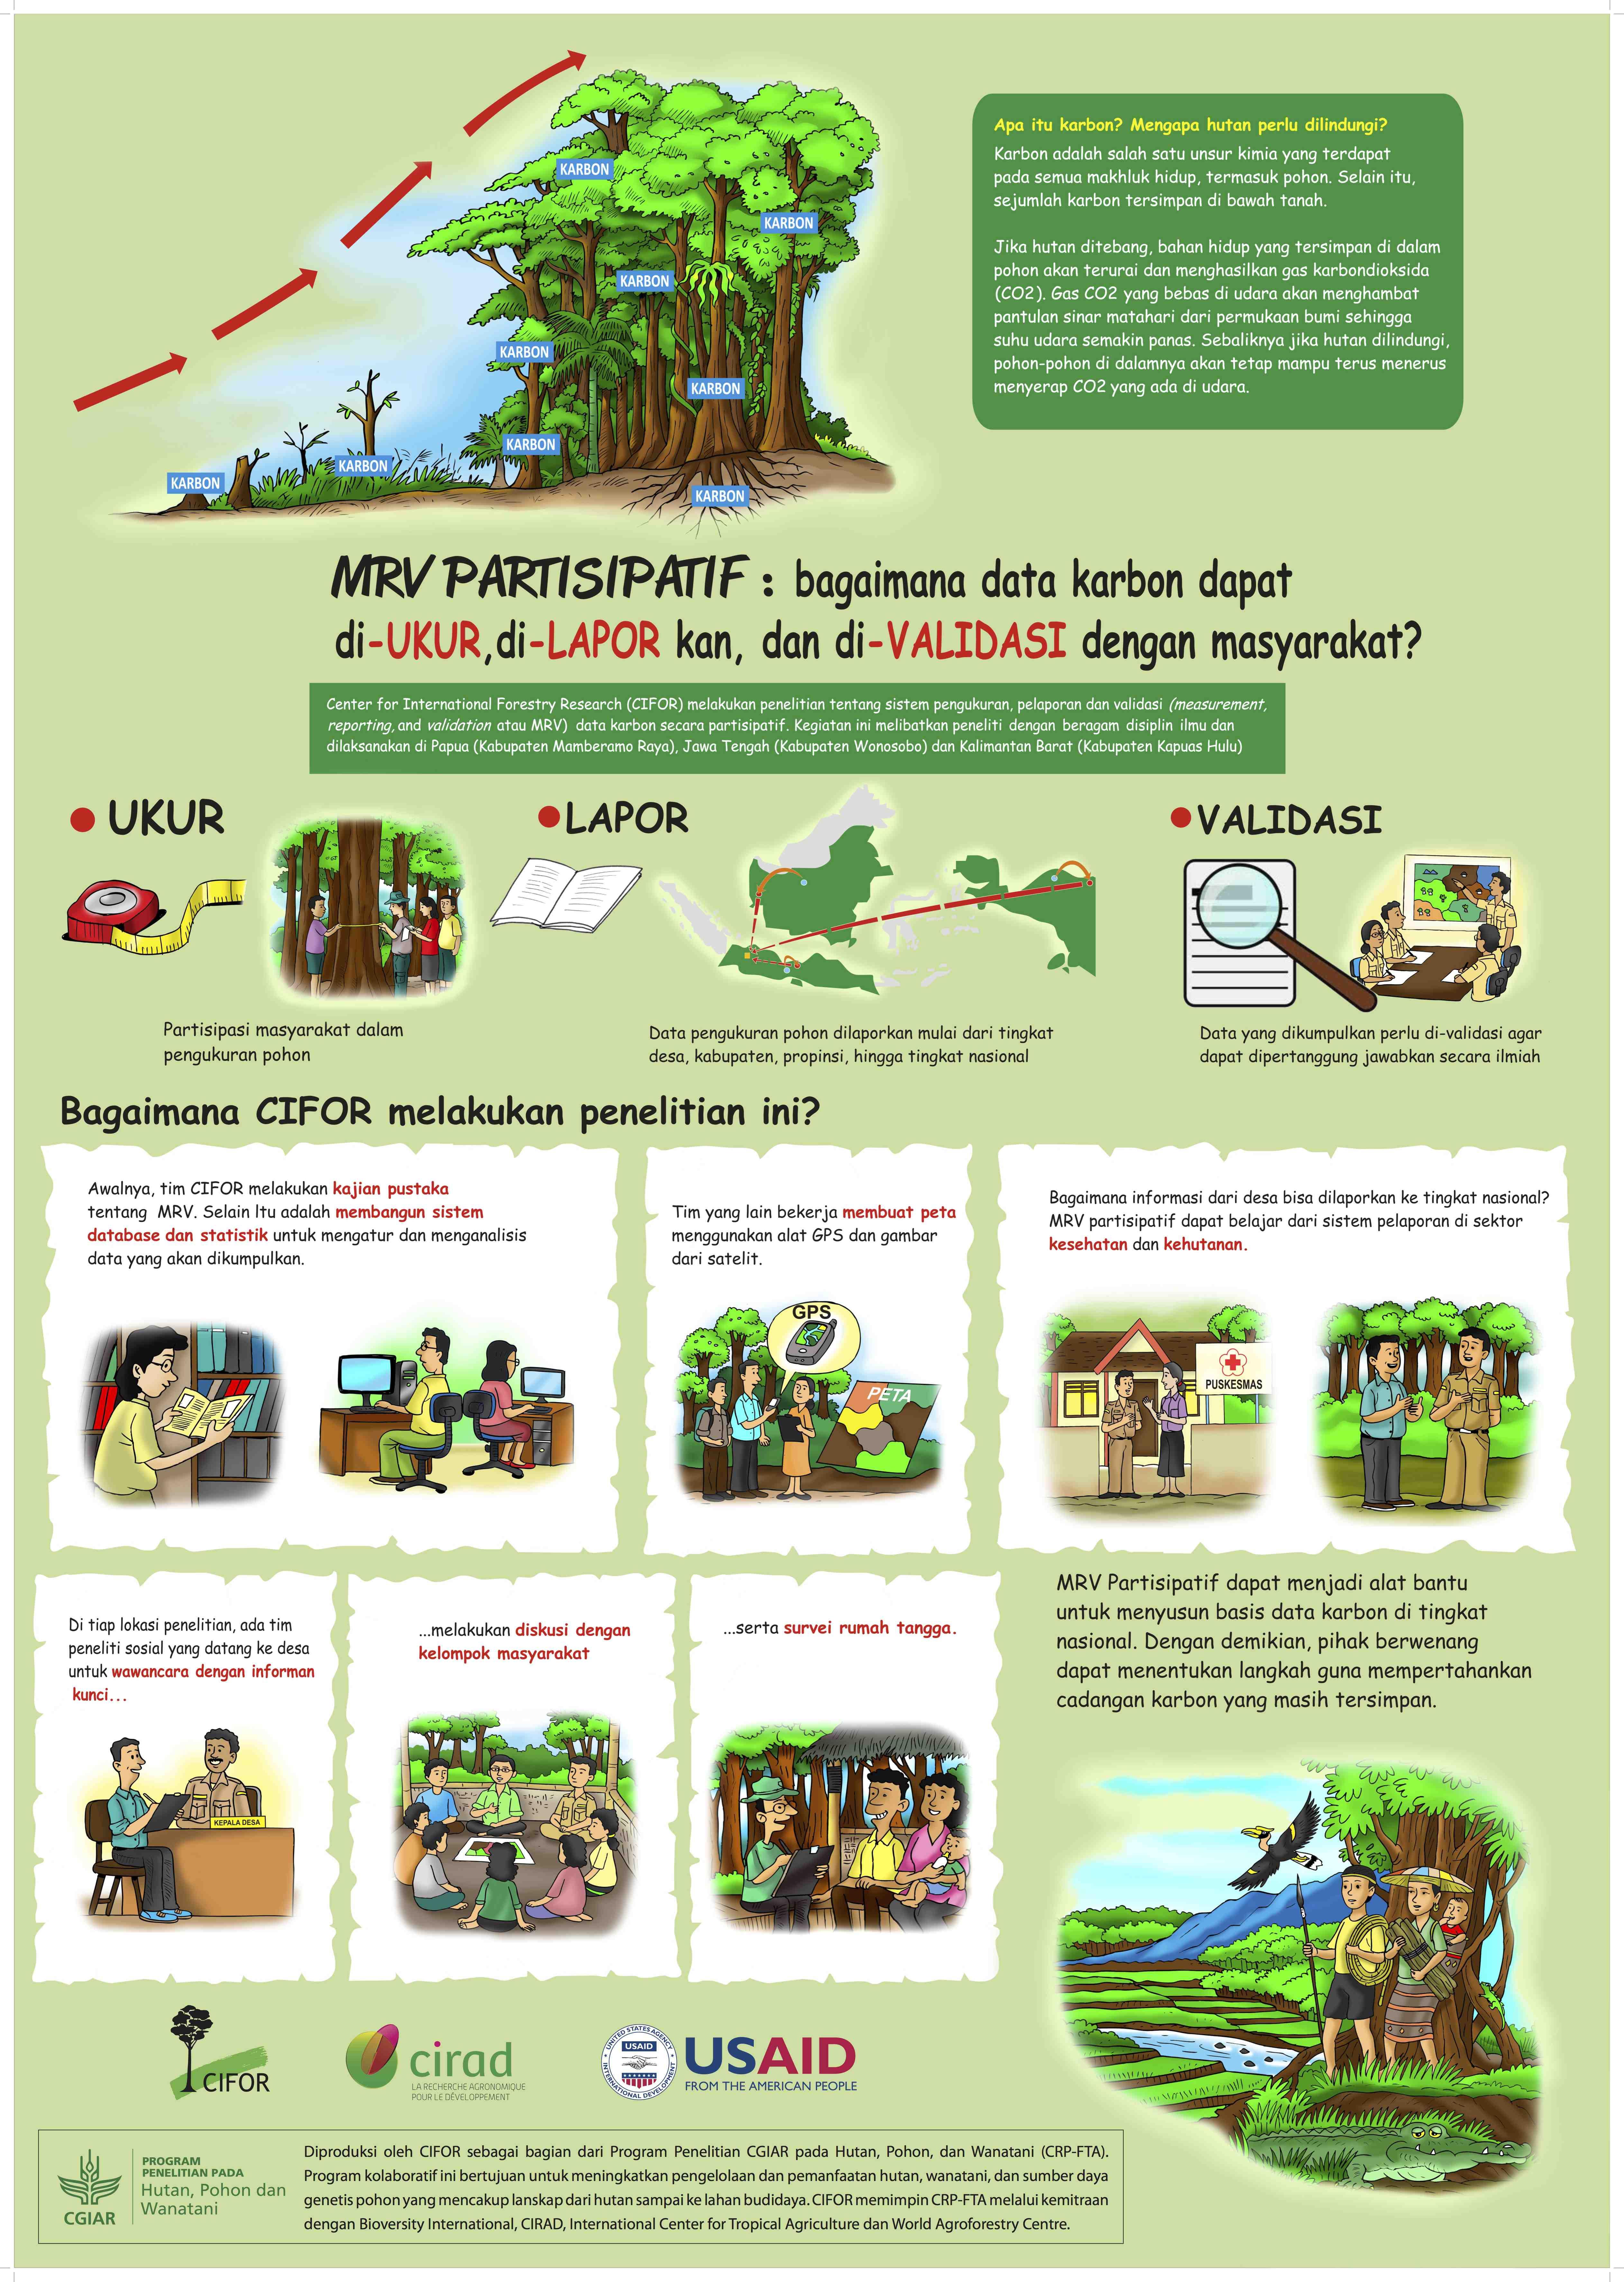 Posters Participatory Mrv Partisipatif Hutan Cifor Kab Bogor